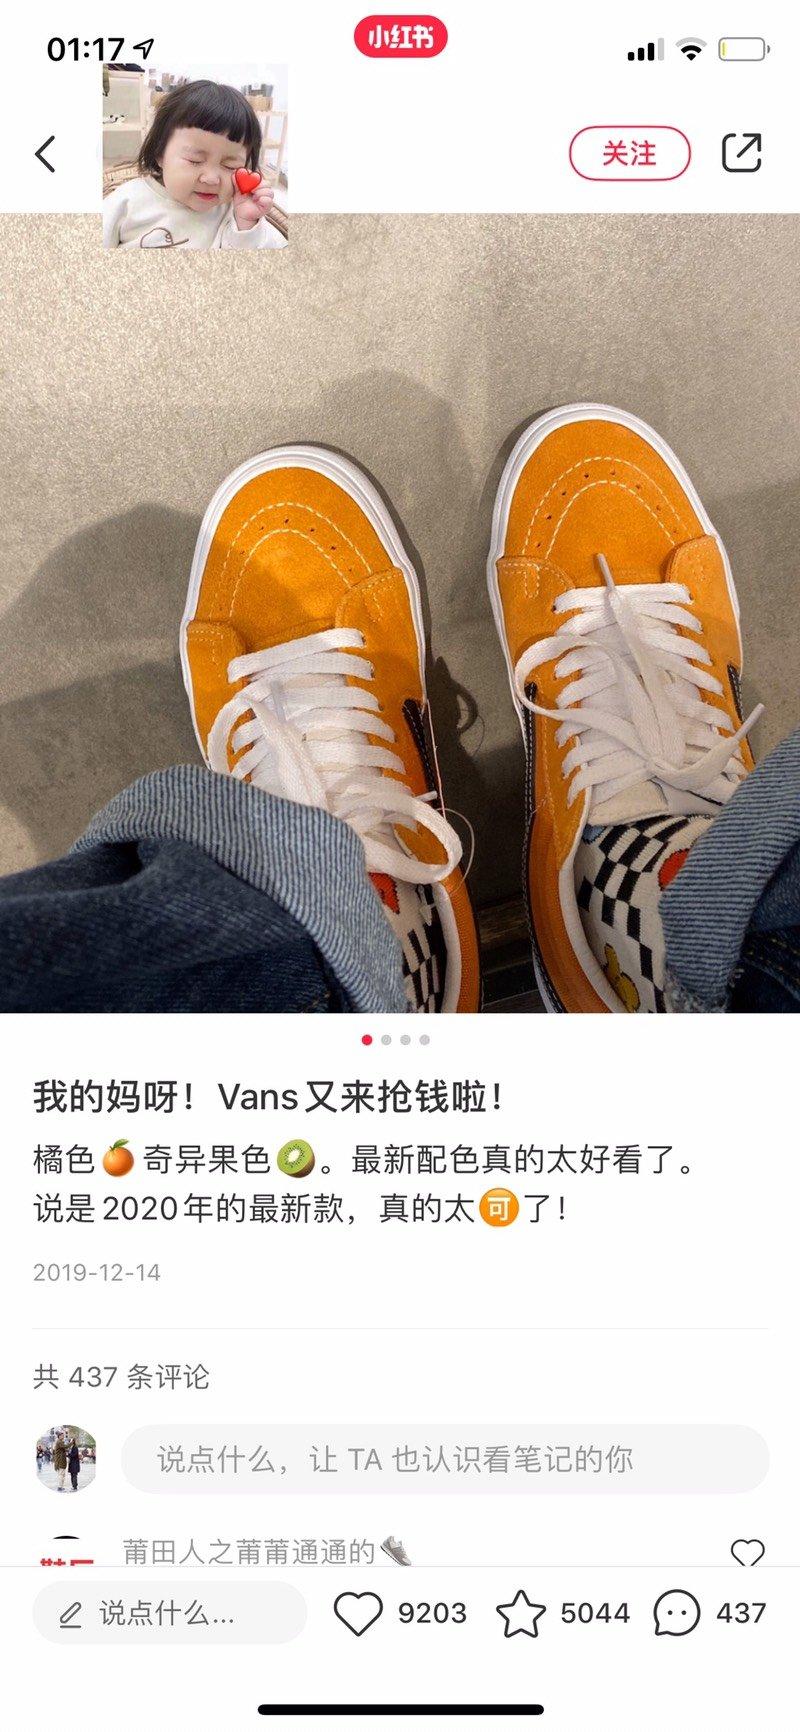 VANS 2120新年配色 奇异果? 橘色?